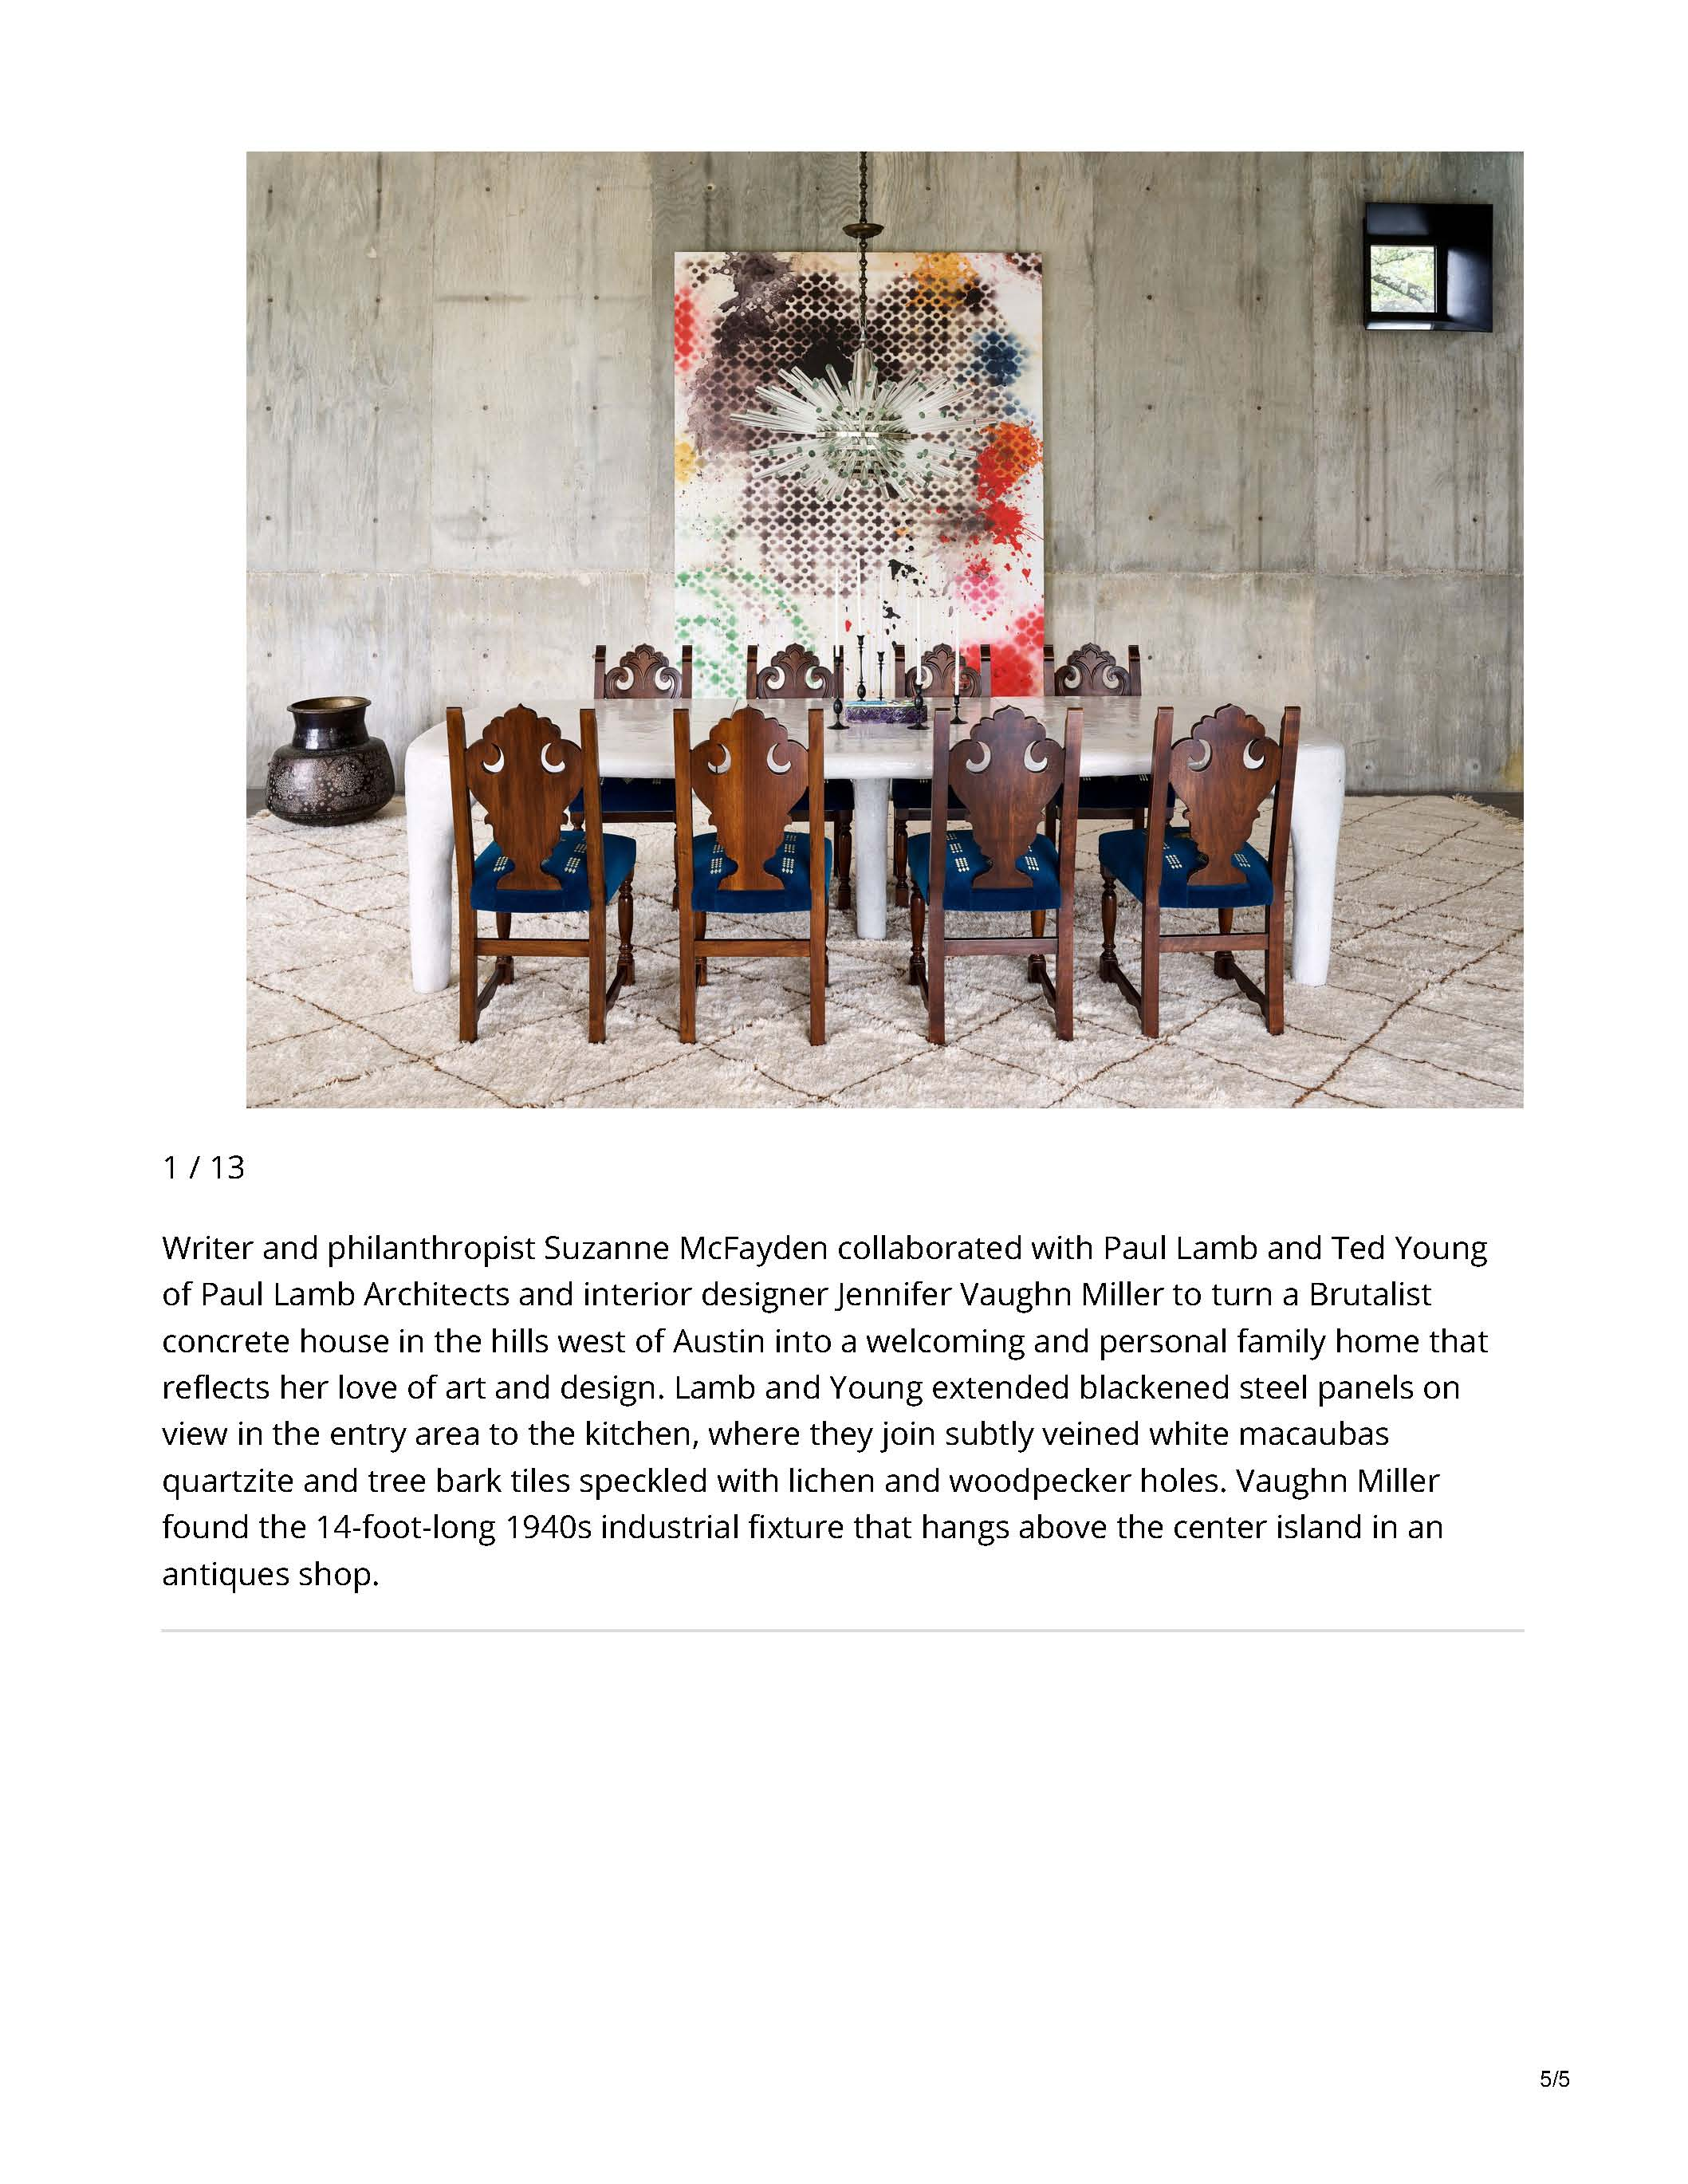 architecturaldigest.com-A Statement-Making Austin Home With a World-Clas..._Page_5.jpg